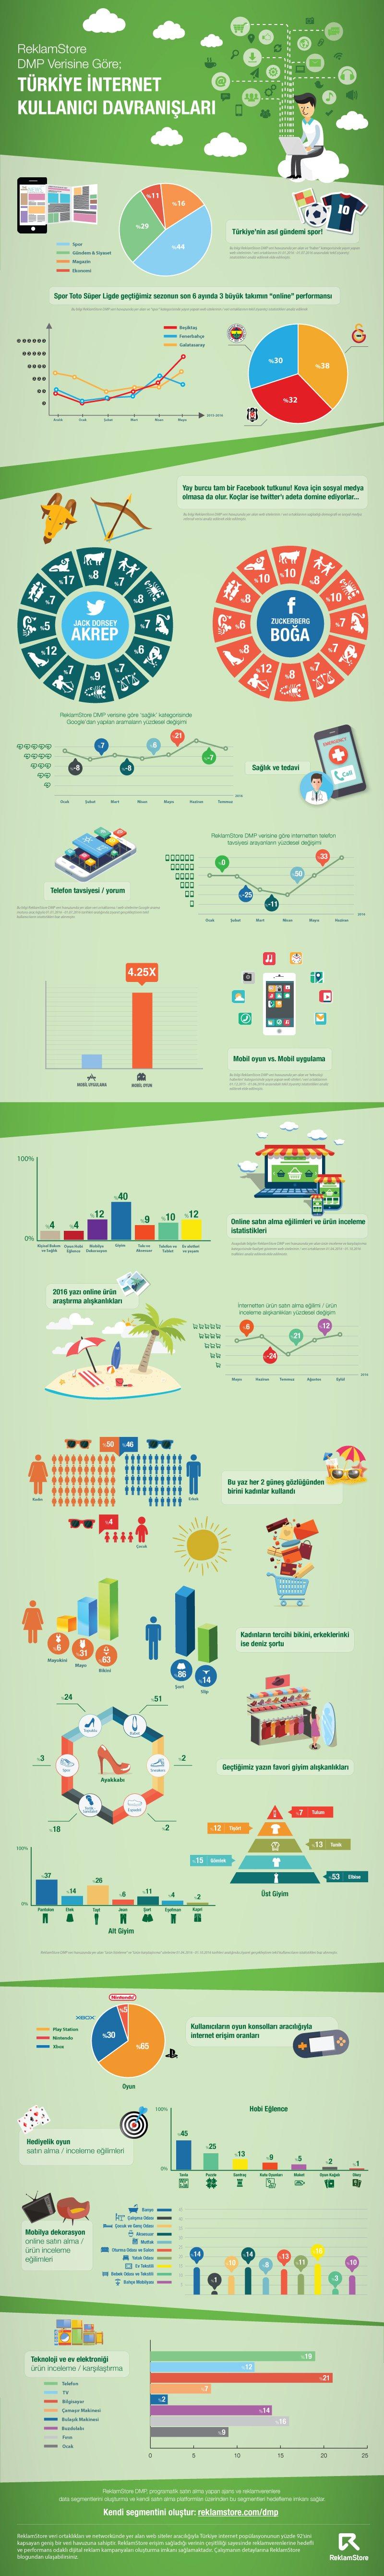 reklamstore-dmp-infografik-2016